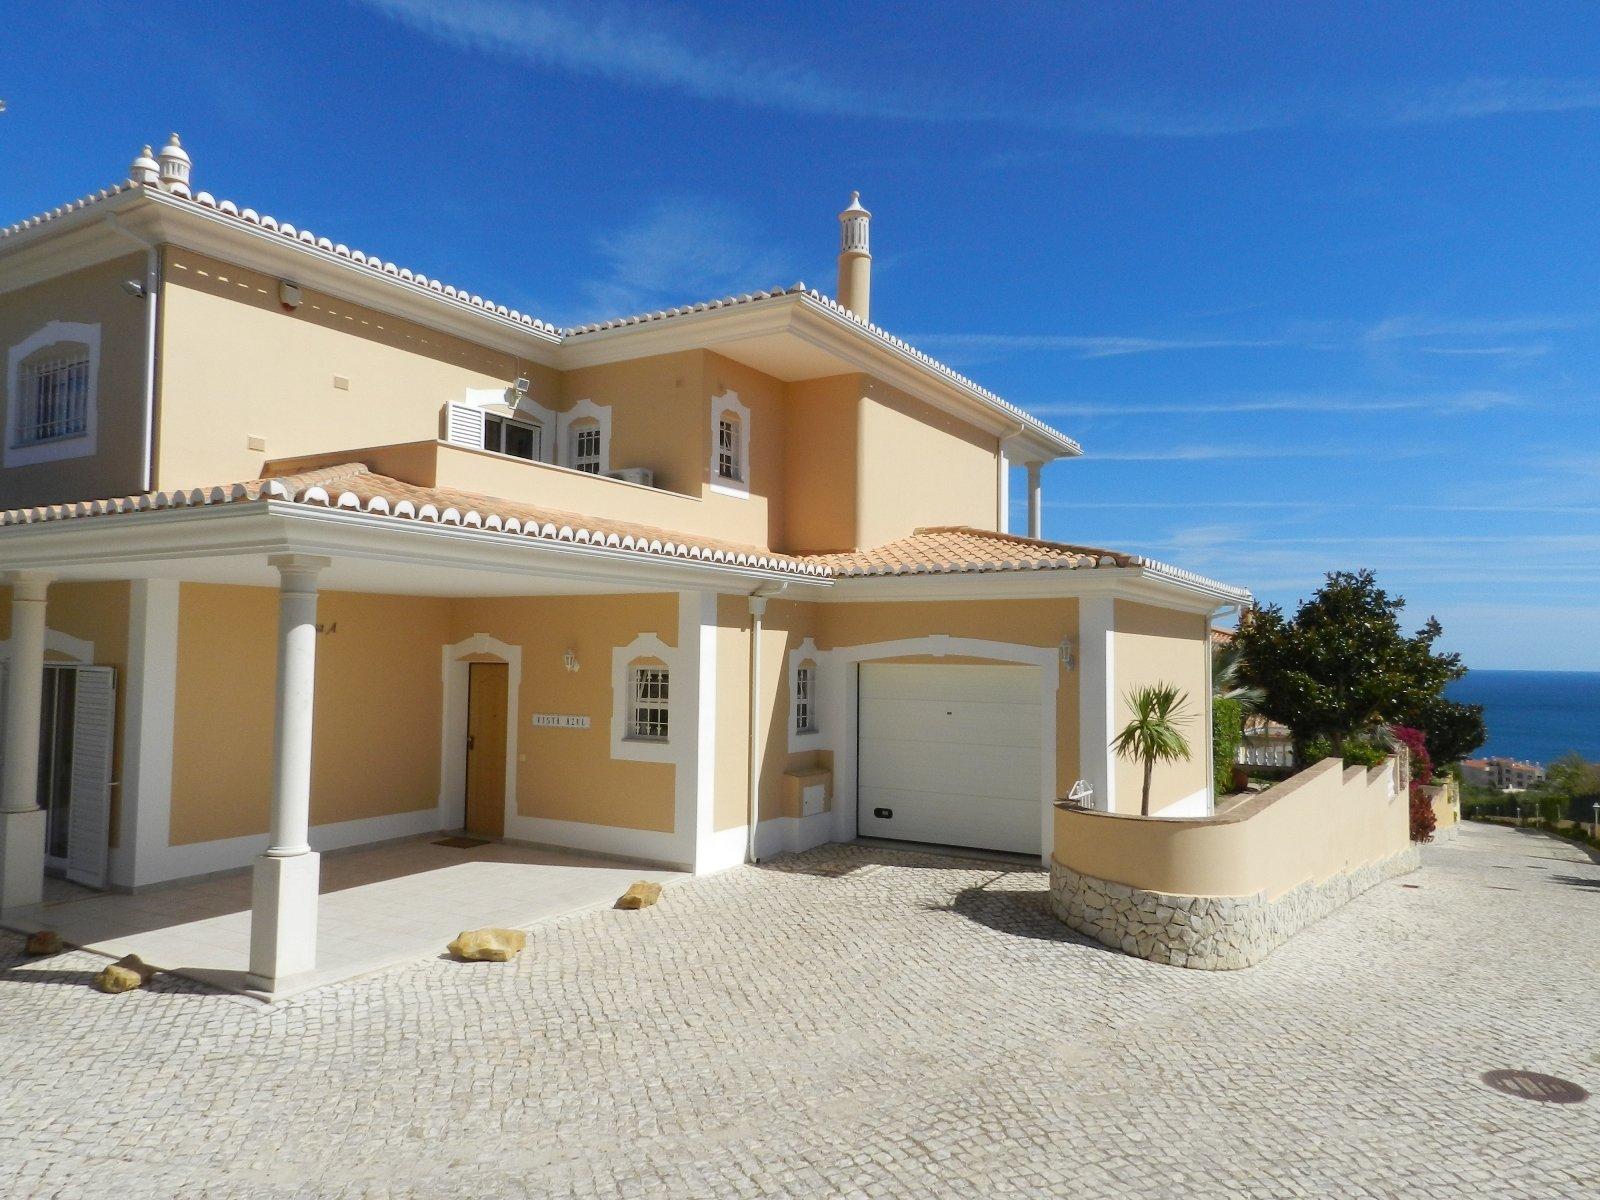 3 Bedroom Villa Praia da Luz, Western Algarve Ref: GV533